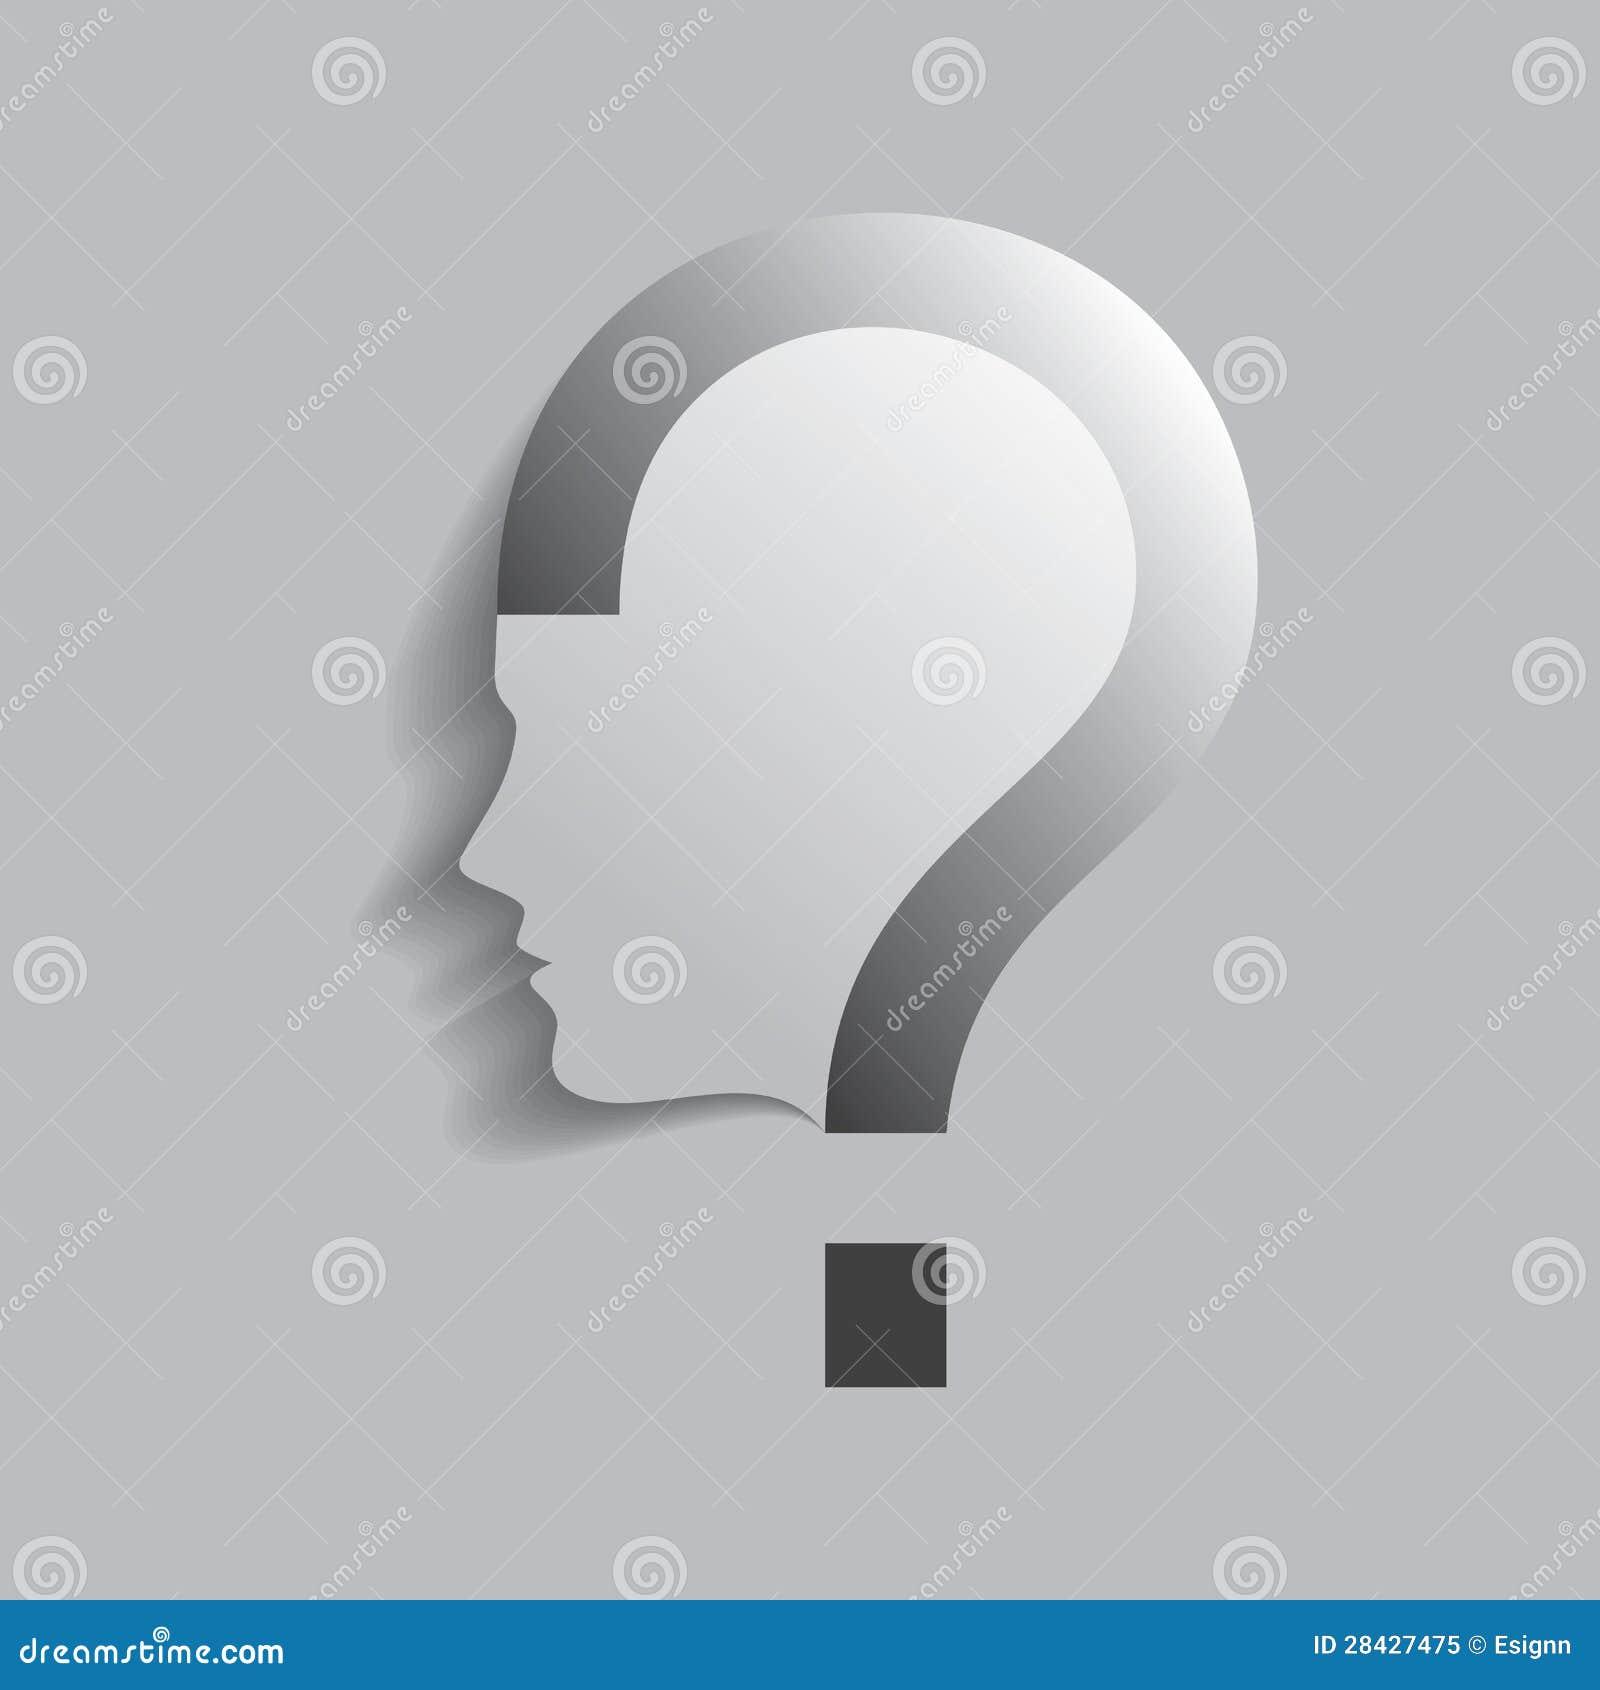 Question Mark Human Head Symbol Stock Vector - Illustration of ...